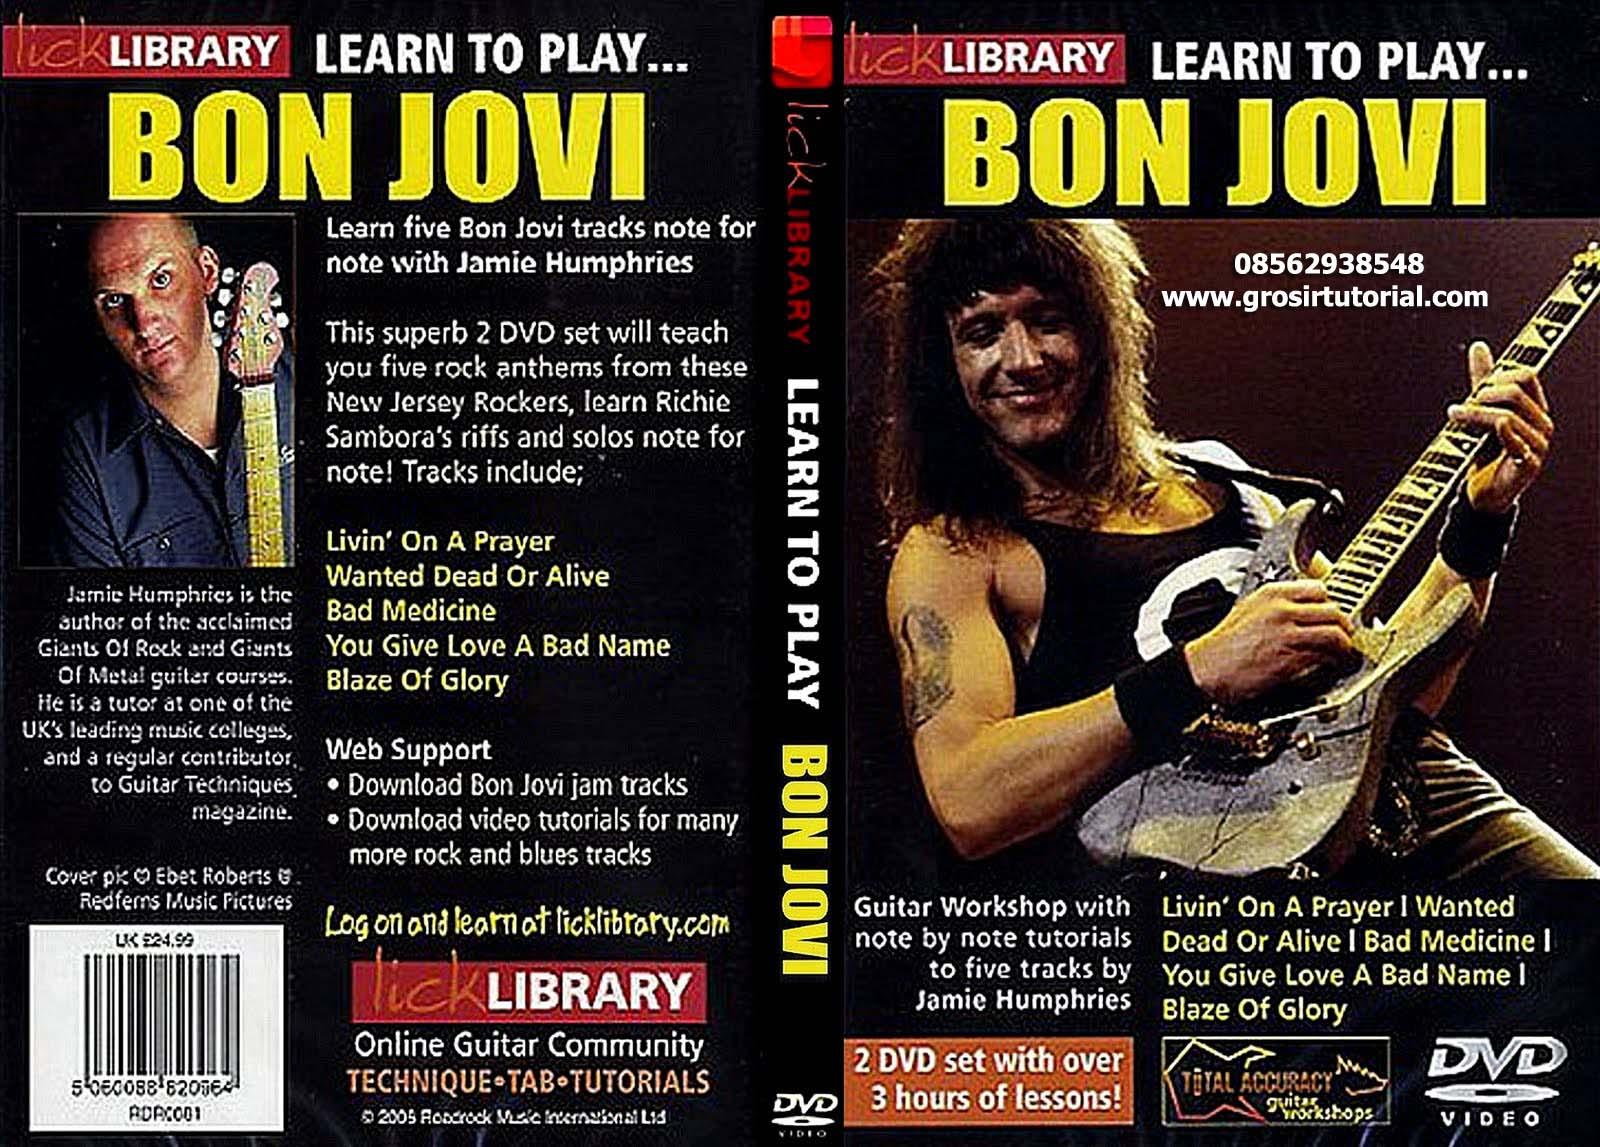 Lick library bon jovi